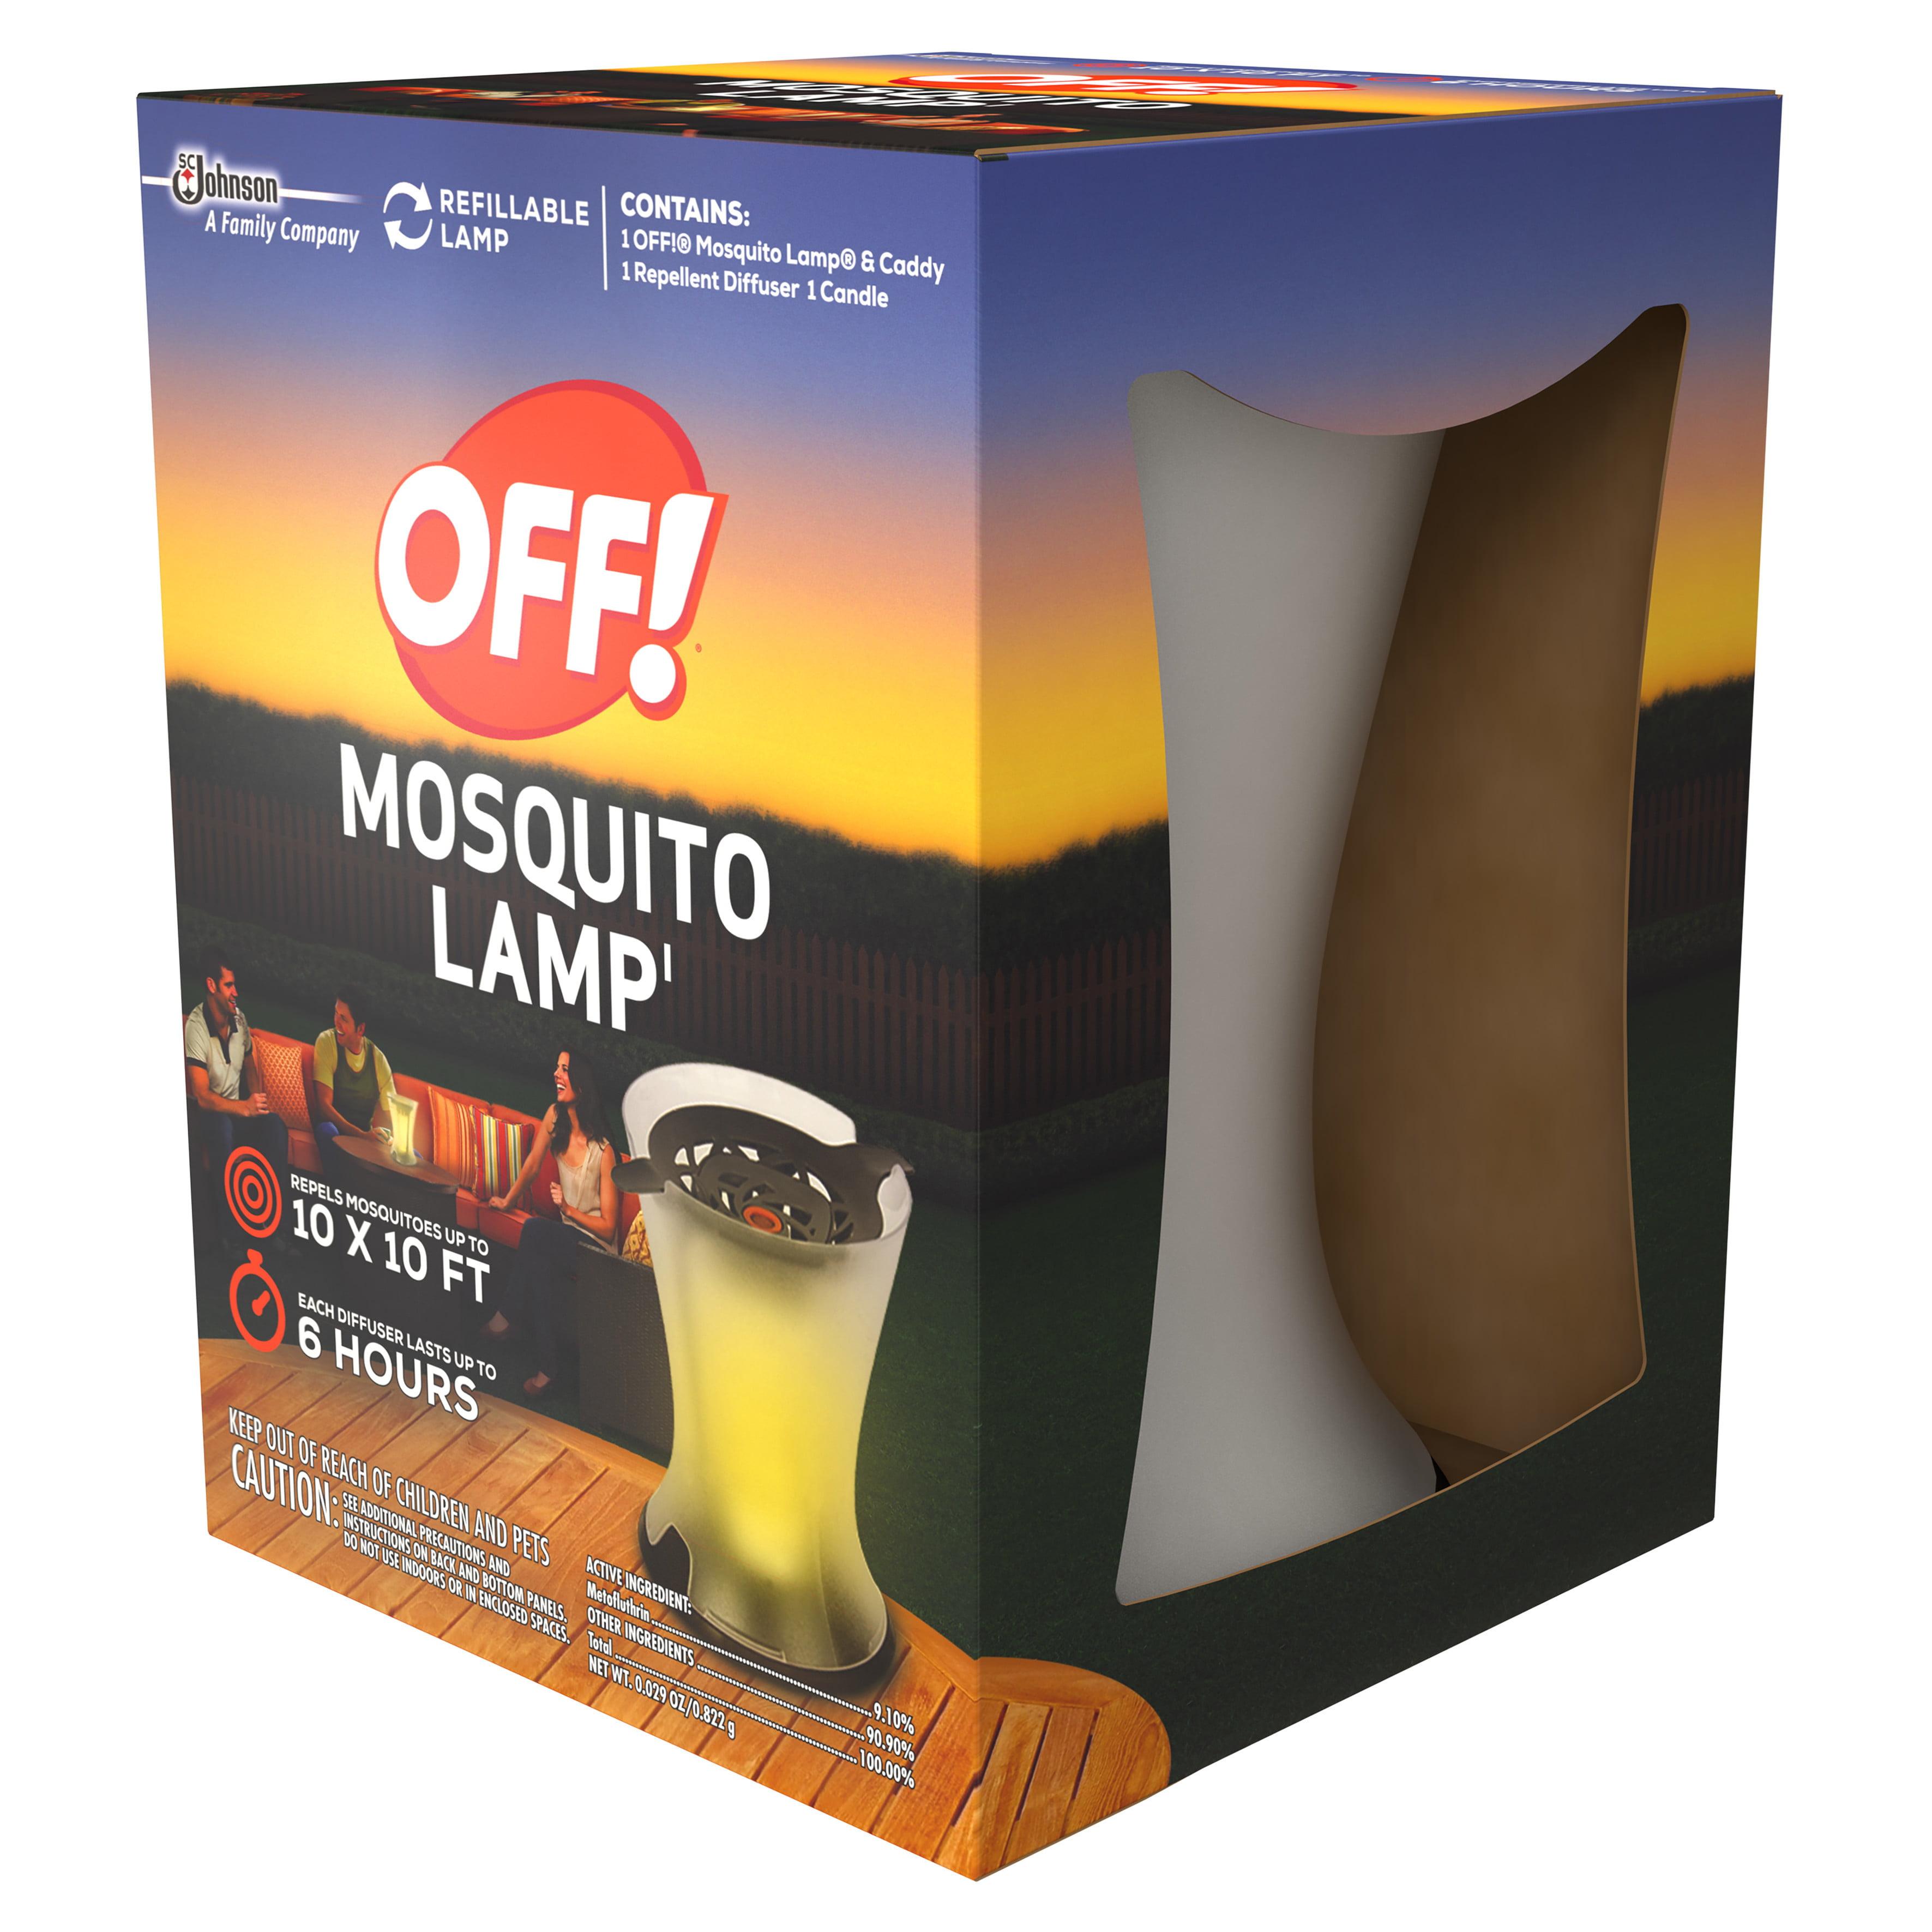 OFF! Mosquito Lamp Starter Kit 0.029 Ounces   Walmart.com